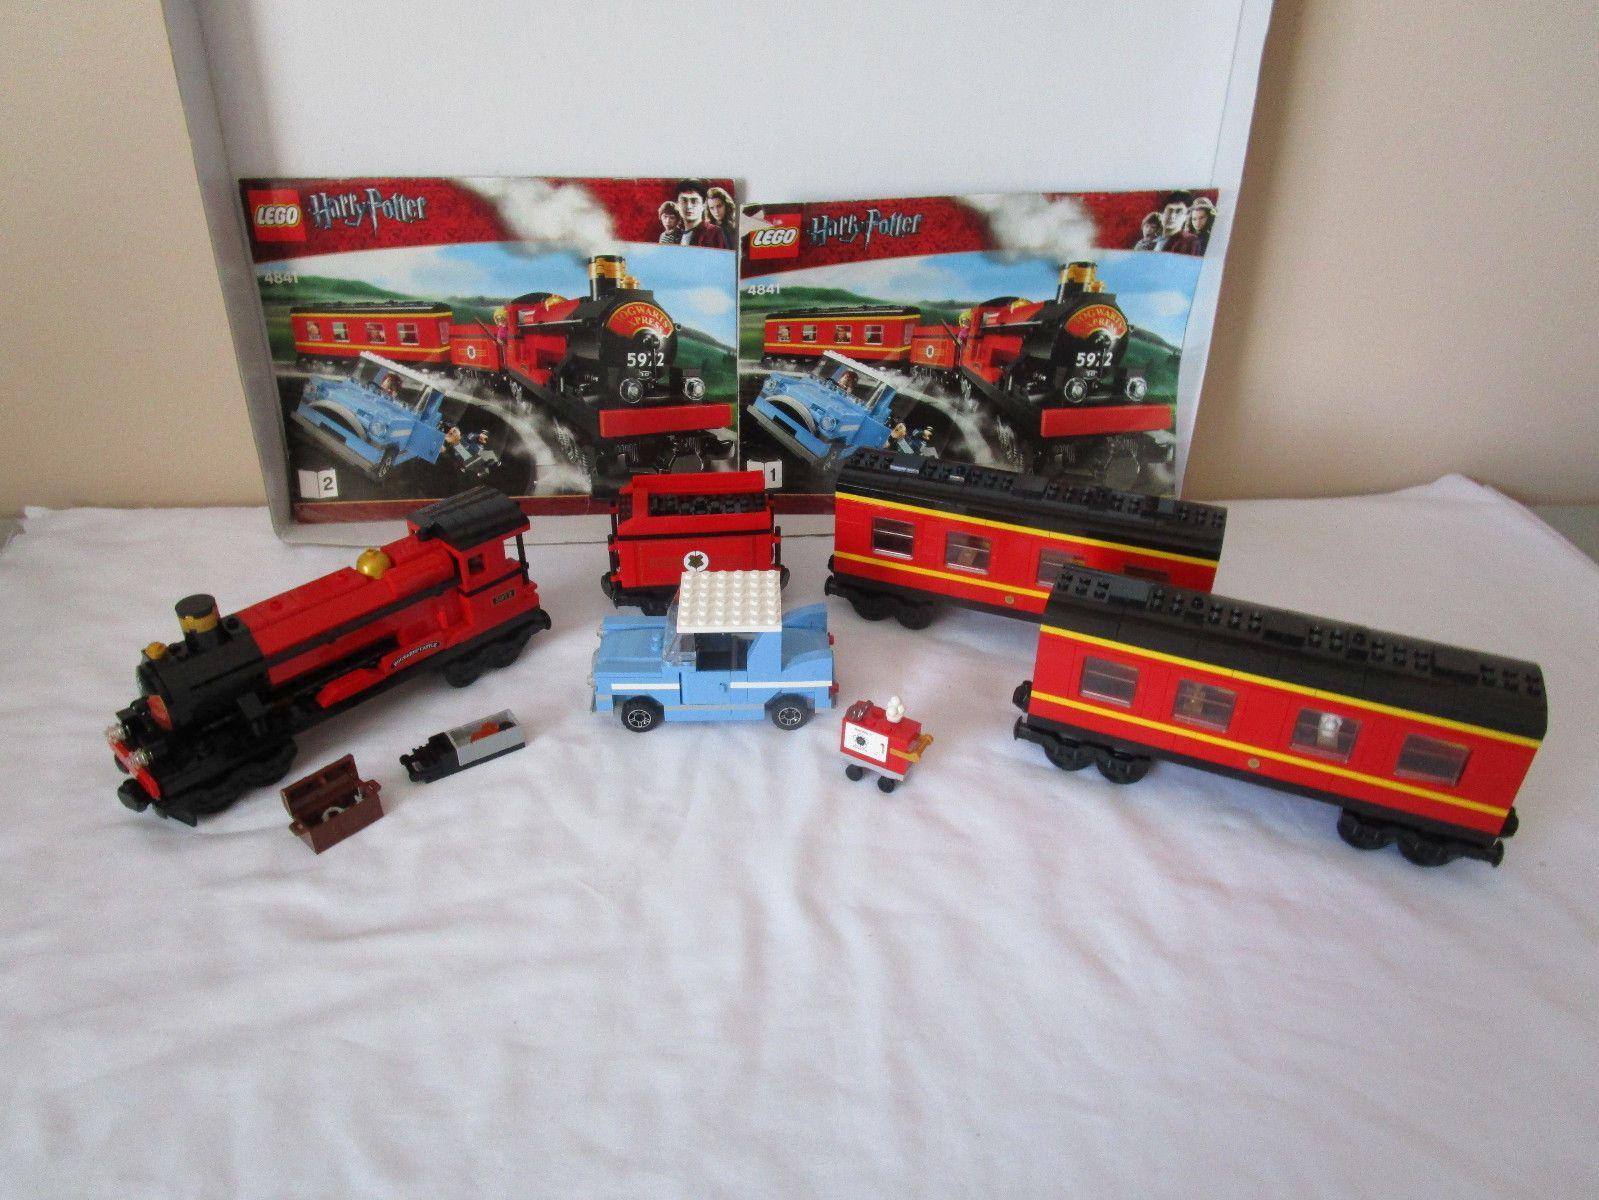 Lego Harry Potter Hogwarts Express Train Set 4841 With Extra Car